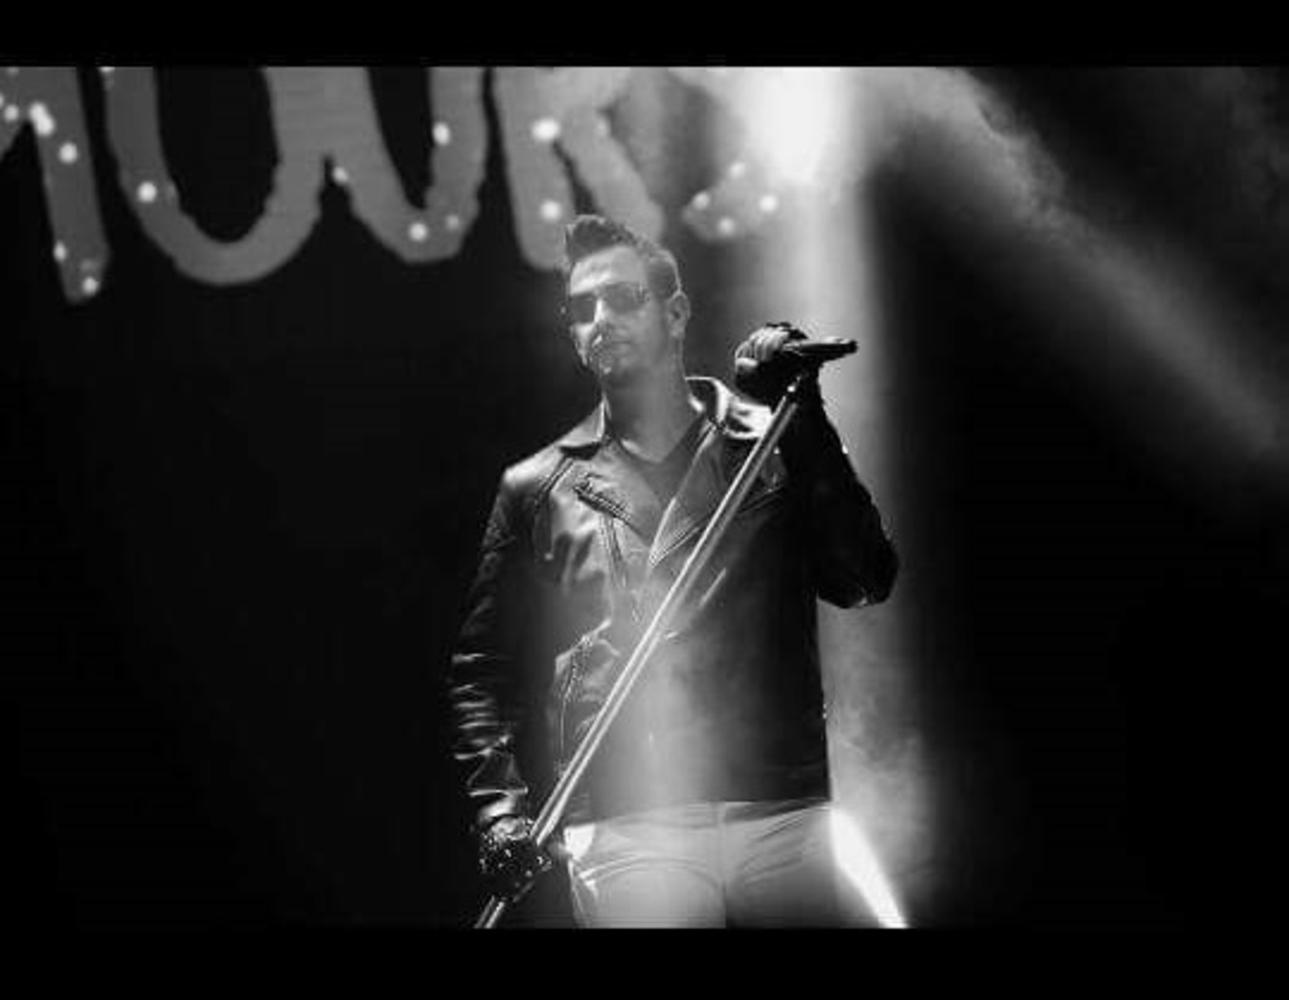 depeche mode tribute uk - HD1289×1000